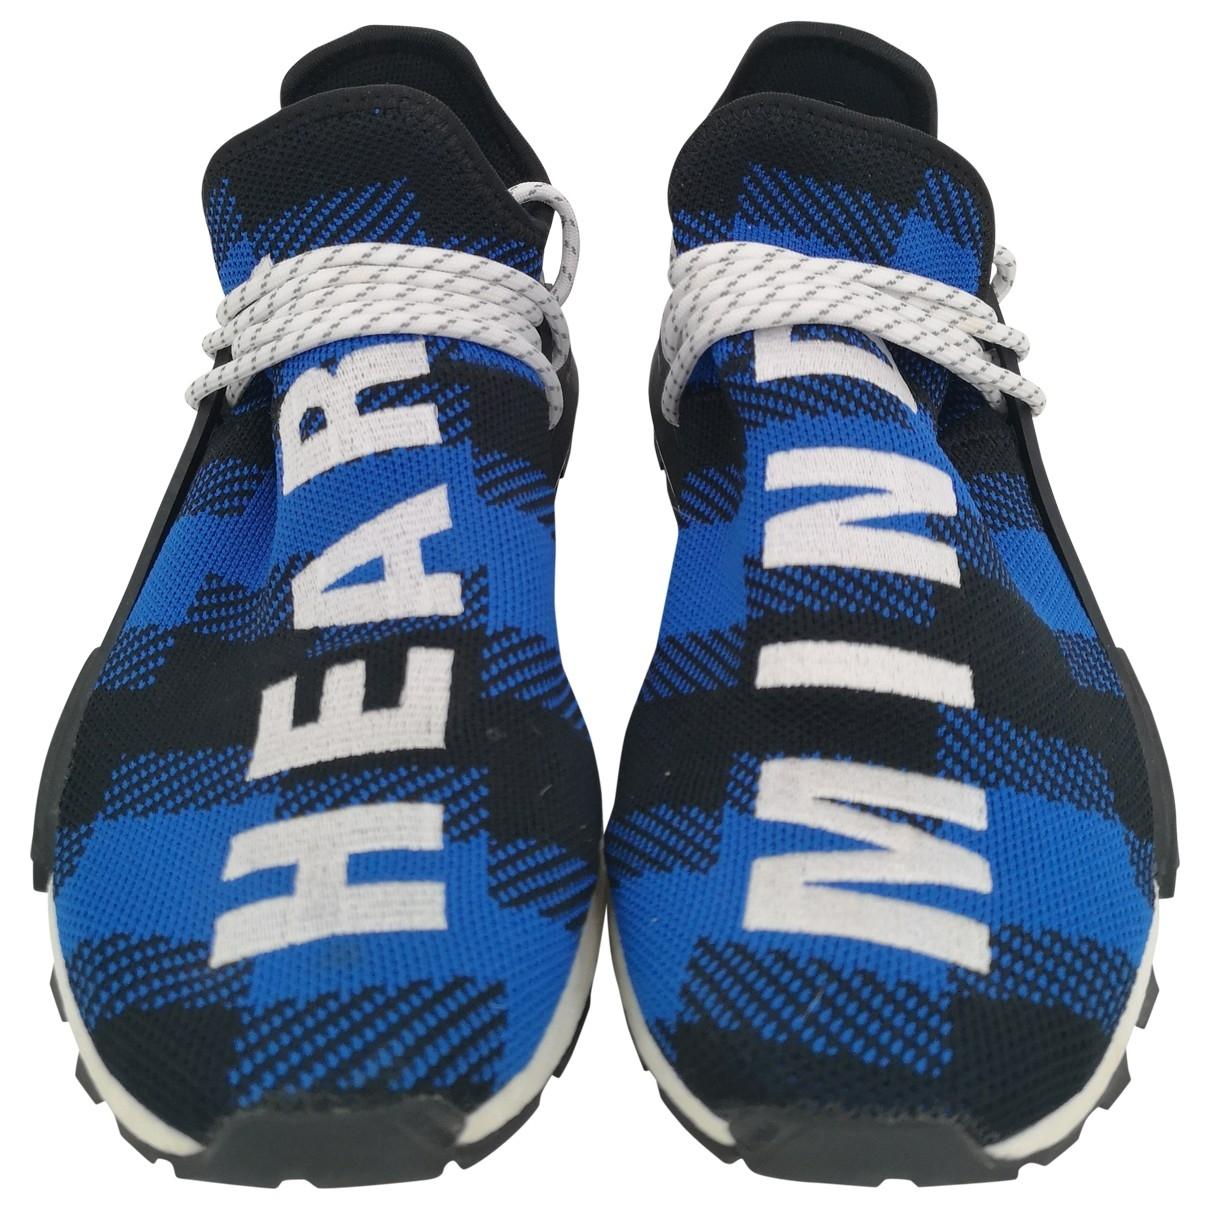 Adidas X Pharrell Williams NMD Hu Blue Cloth Trainers for Men 9 UK